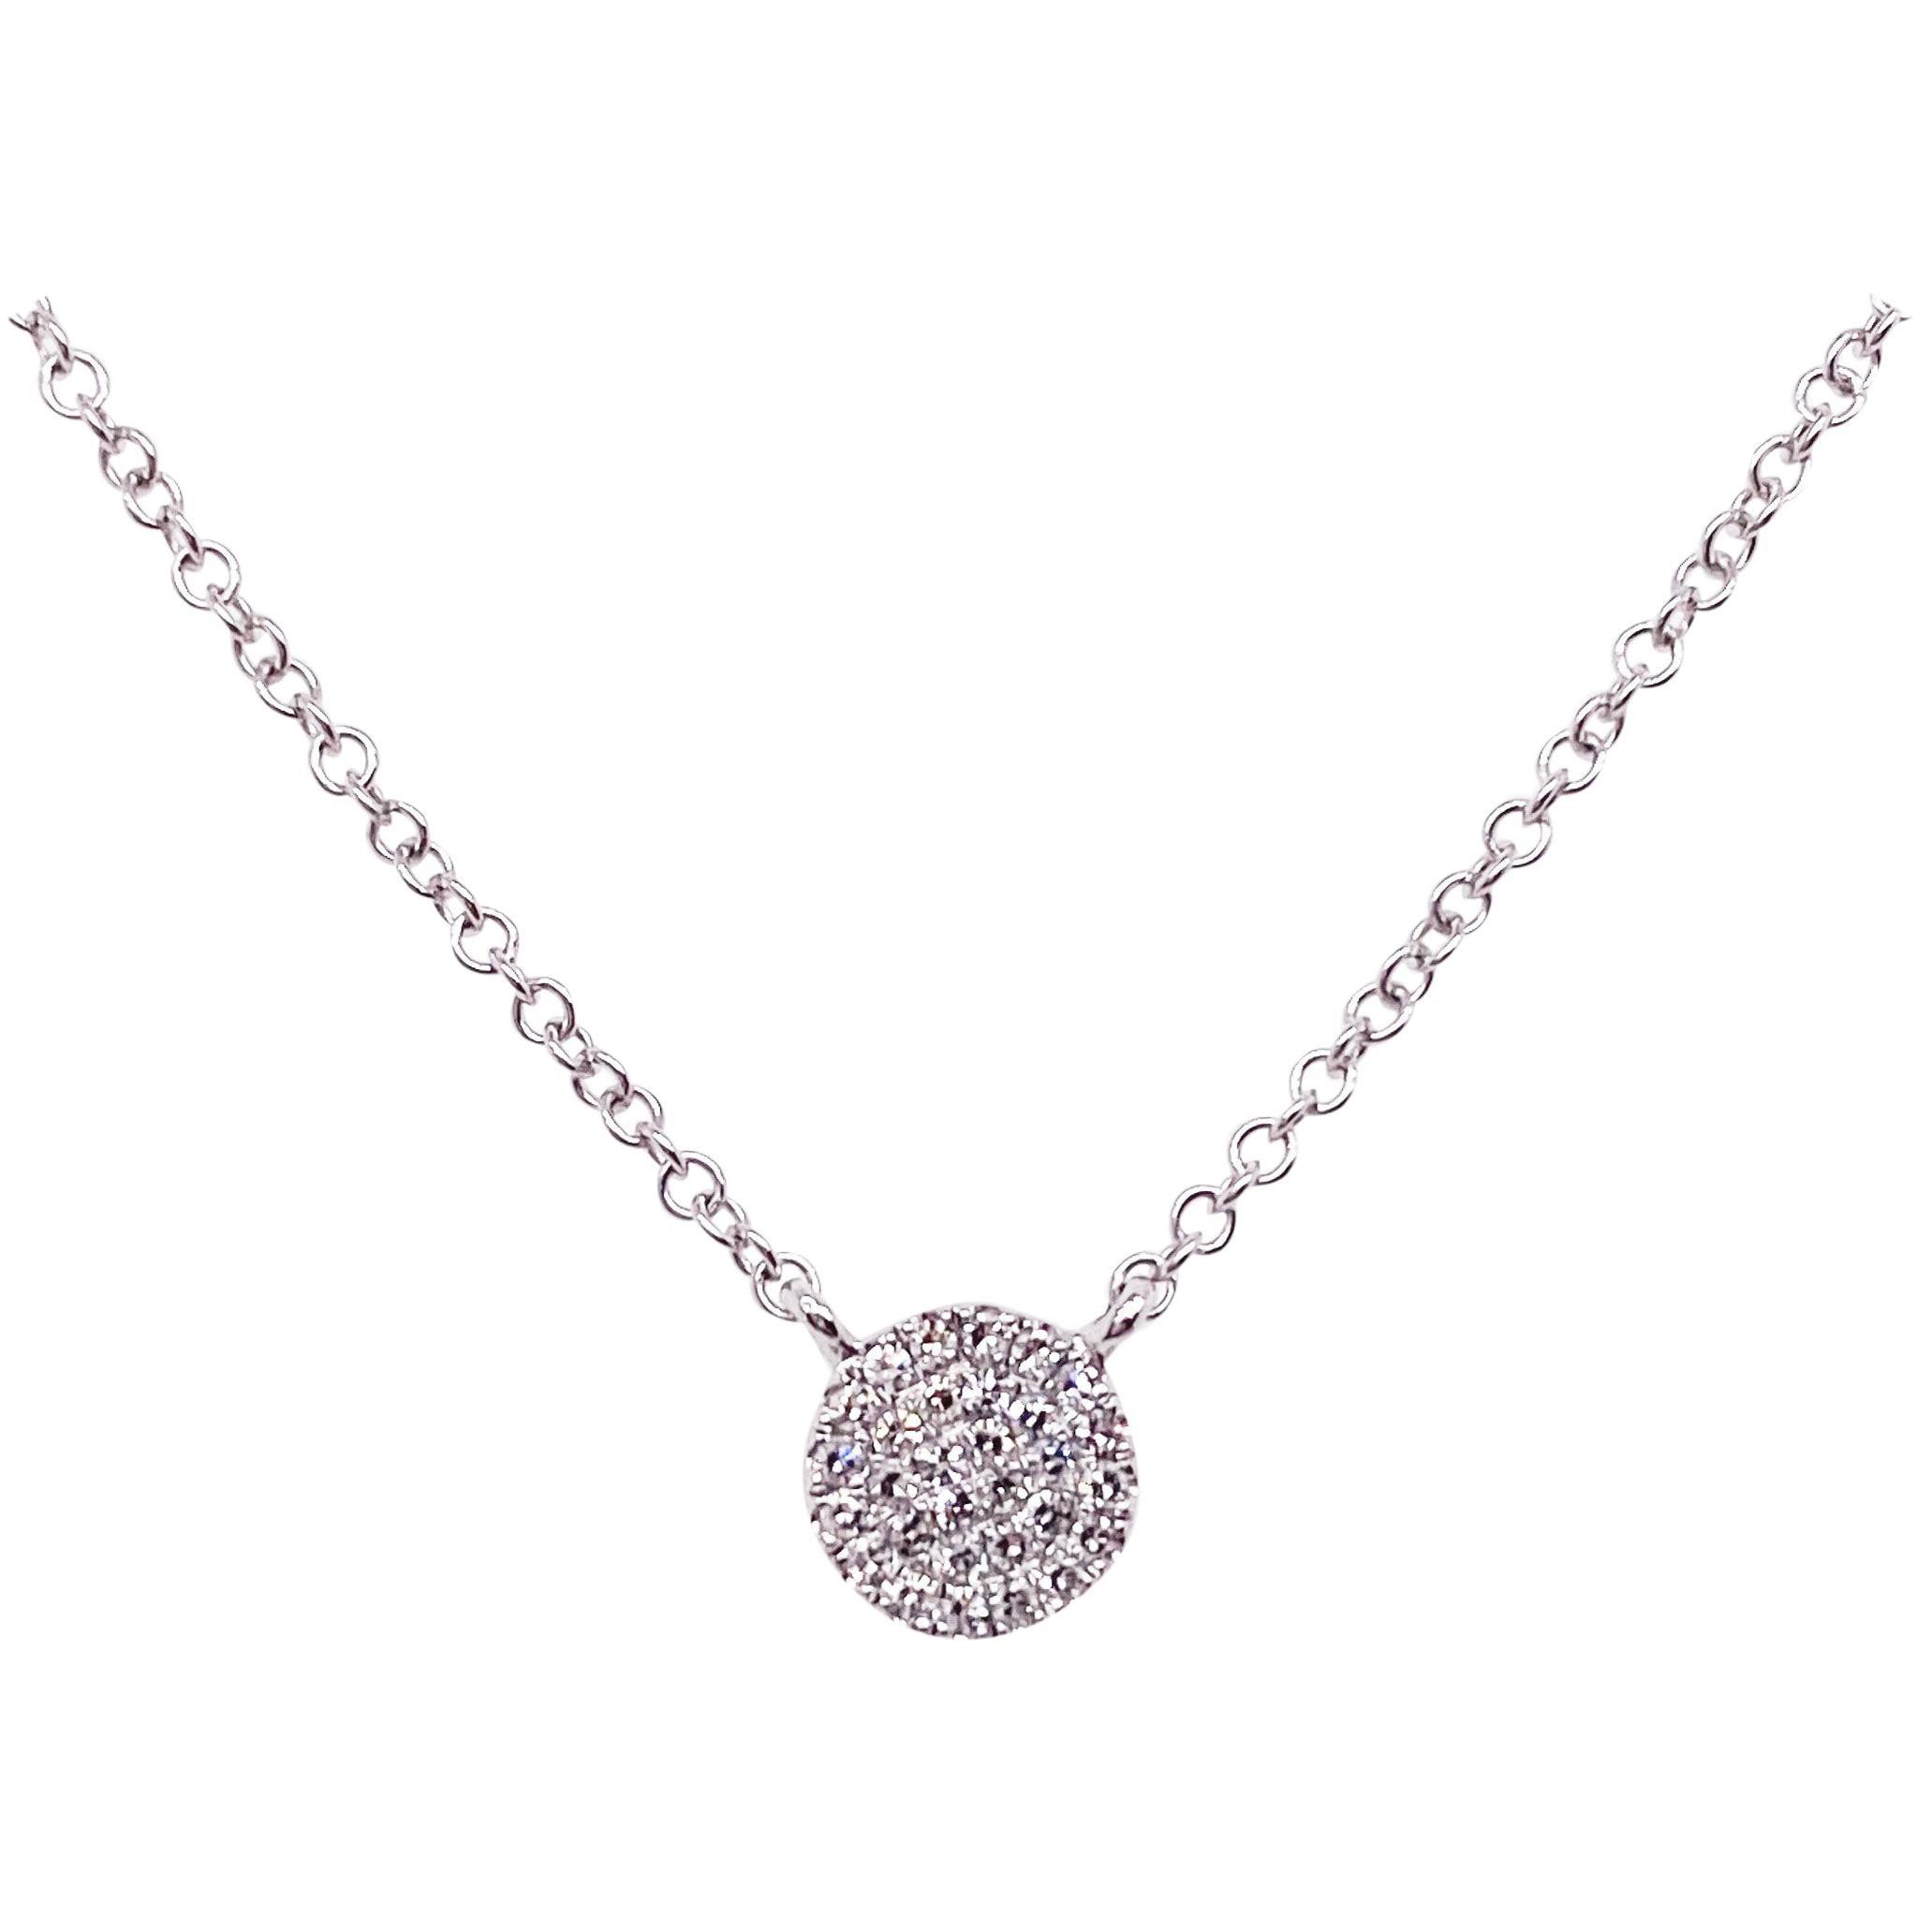 Diamond Disk Necklace, 14 Karat White Gold, Round Pavé Diamond Disk Pendant